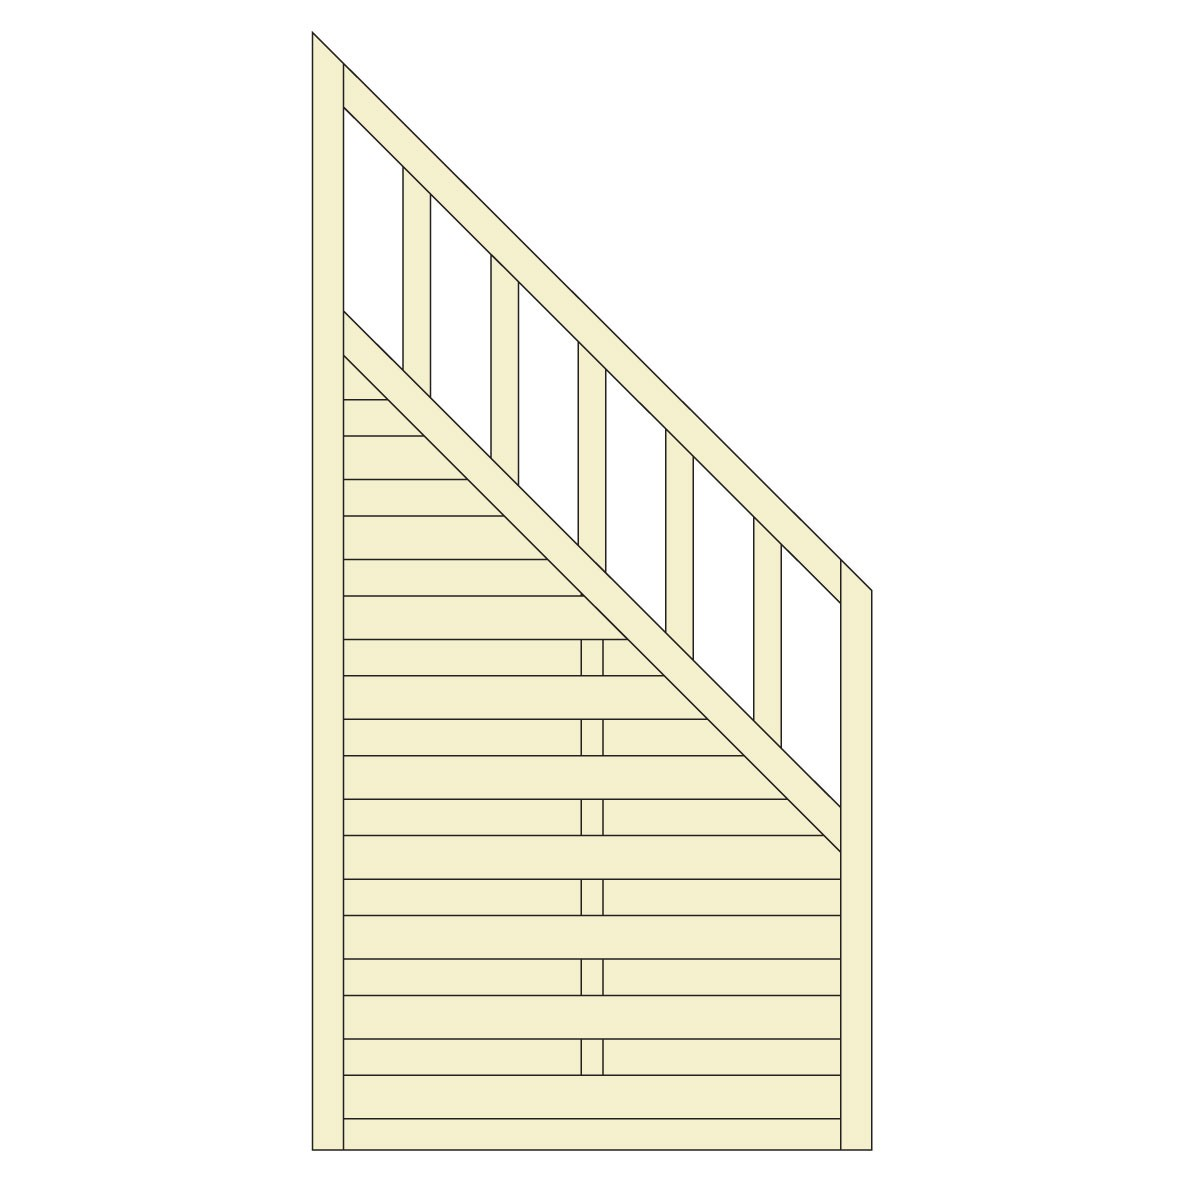 sichtschutzzaun freiburg zaunelement dichtzaun holz kdi 90x180 90cm bei. Black Bedroom Furniture Sets. Home Design Ideas